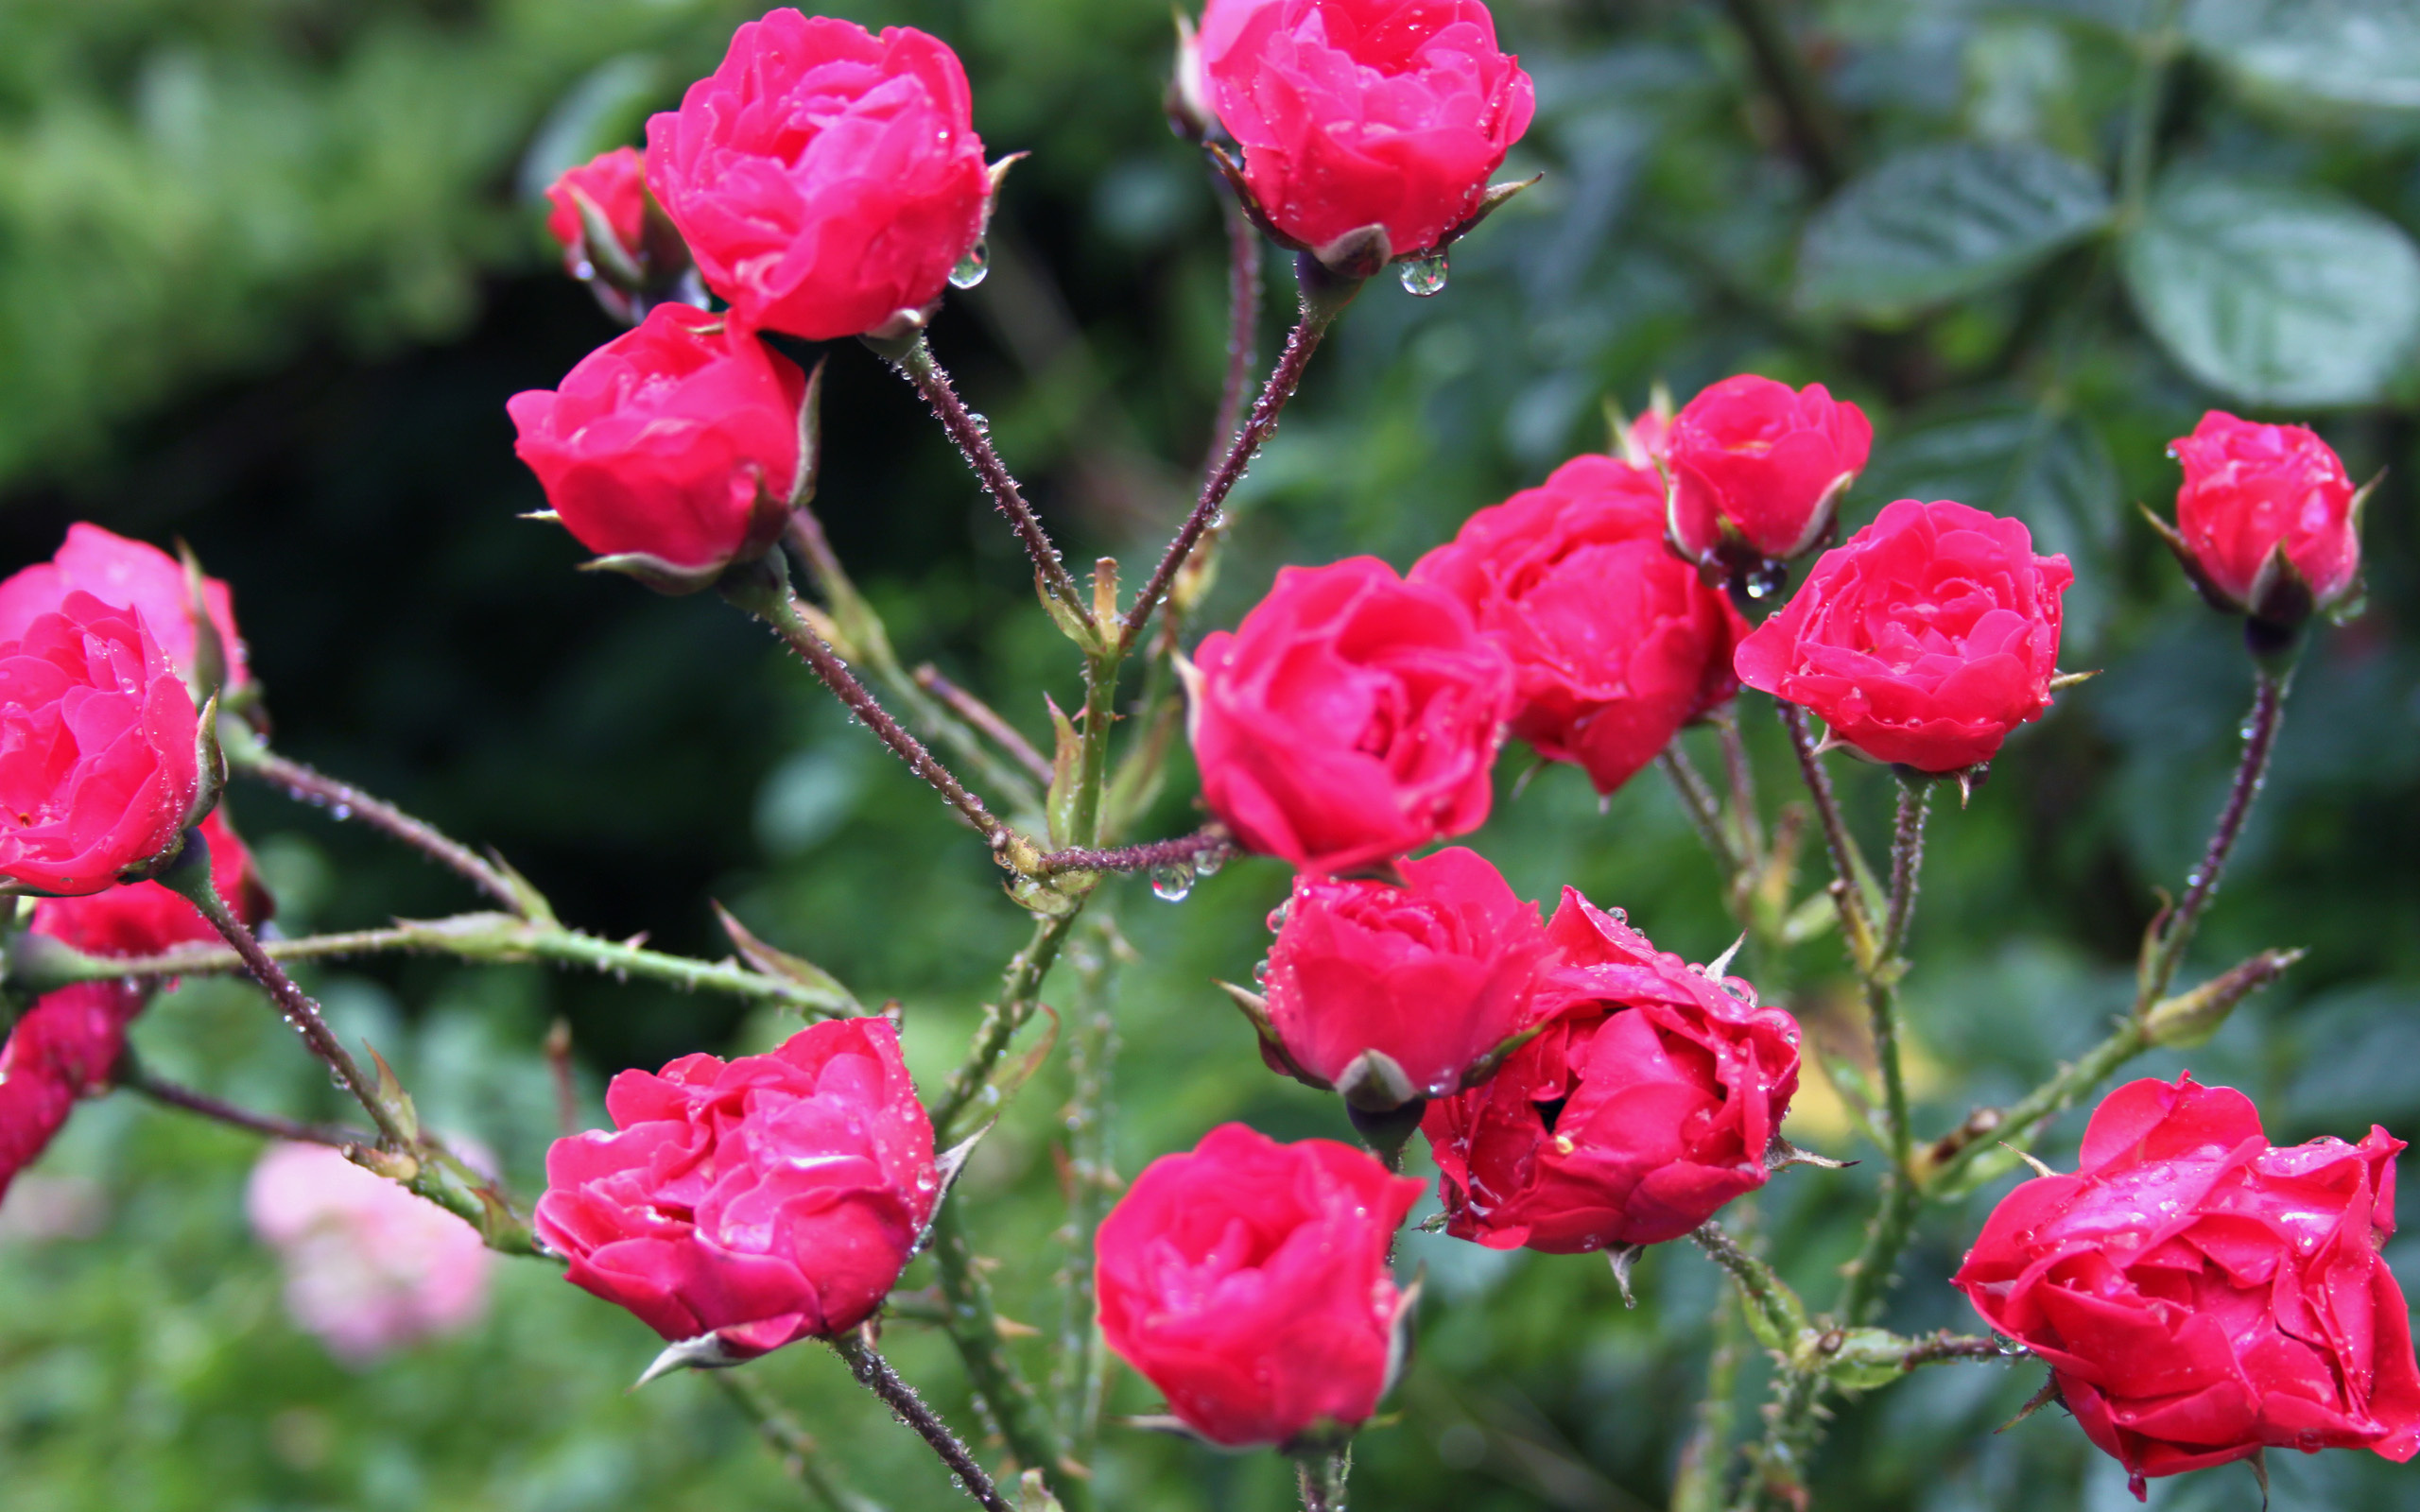 Rose bush hd wallpaper background image 2560x1600 id - Big rose flower wallpaper ...